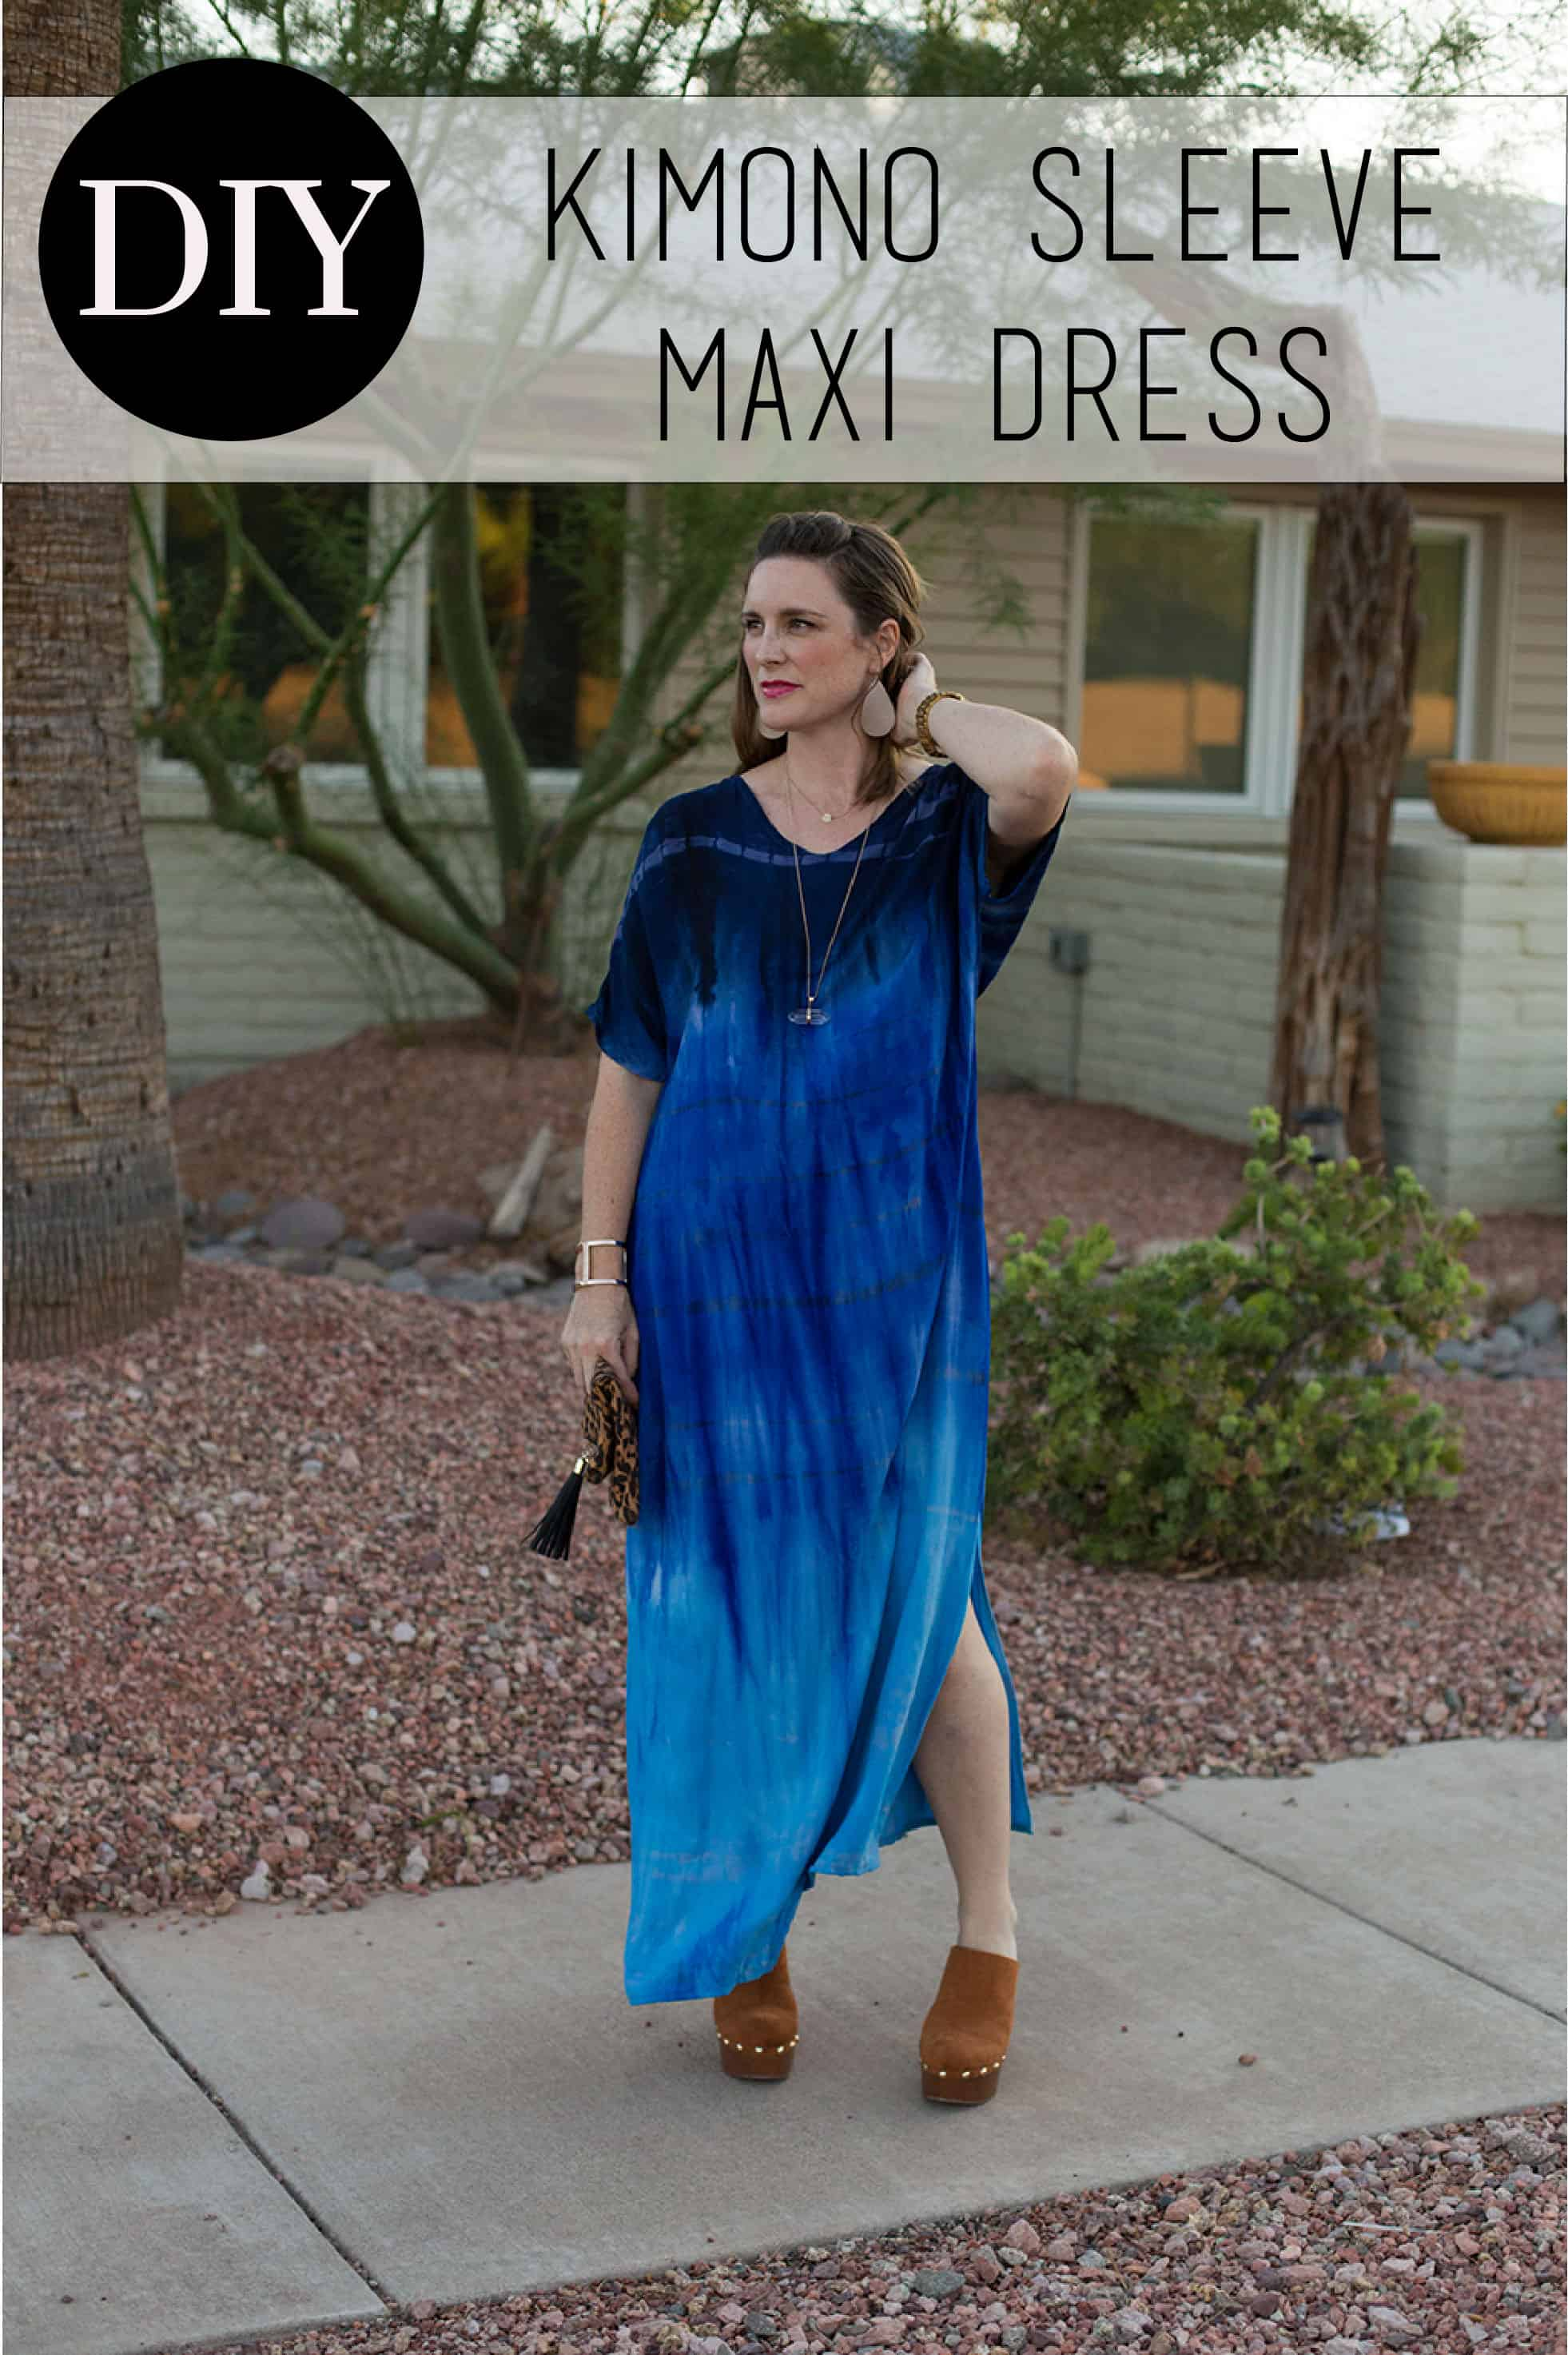 Diy kimono sleeve maxi dress bonnie and blithe diy kimono sleeve maxi dress jeuxipadfo Images